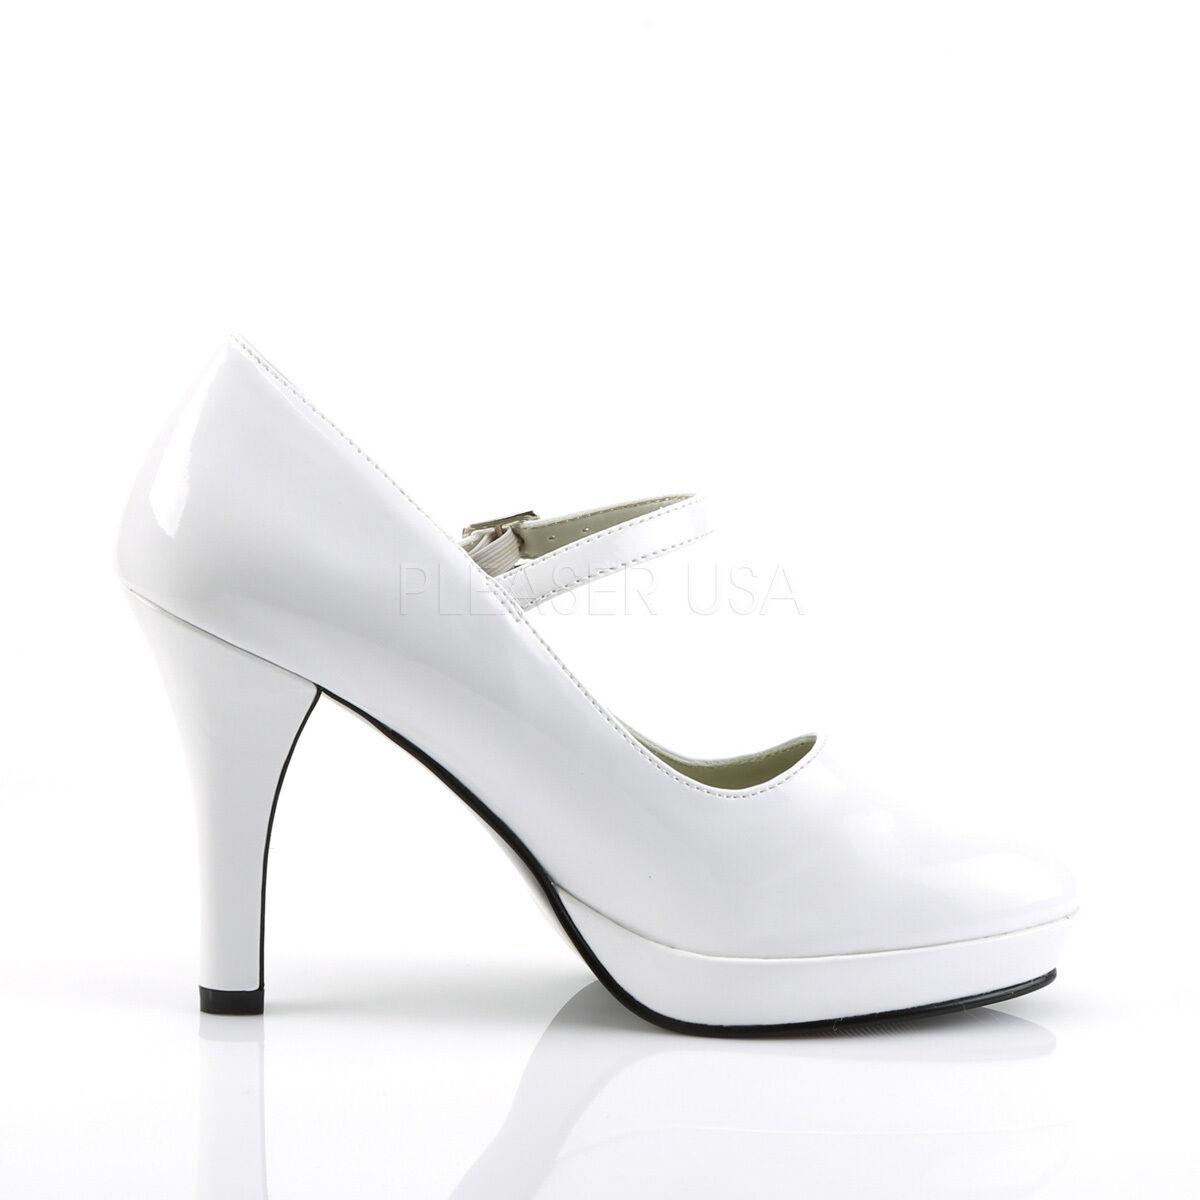 Sale Miniplateau Funtasma Damen Miniplateau Sale High Heels Pumps Contessa-50 weiß Lack Größe 41 b14c53